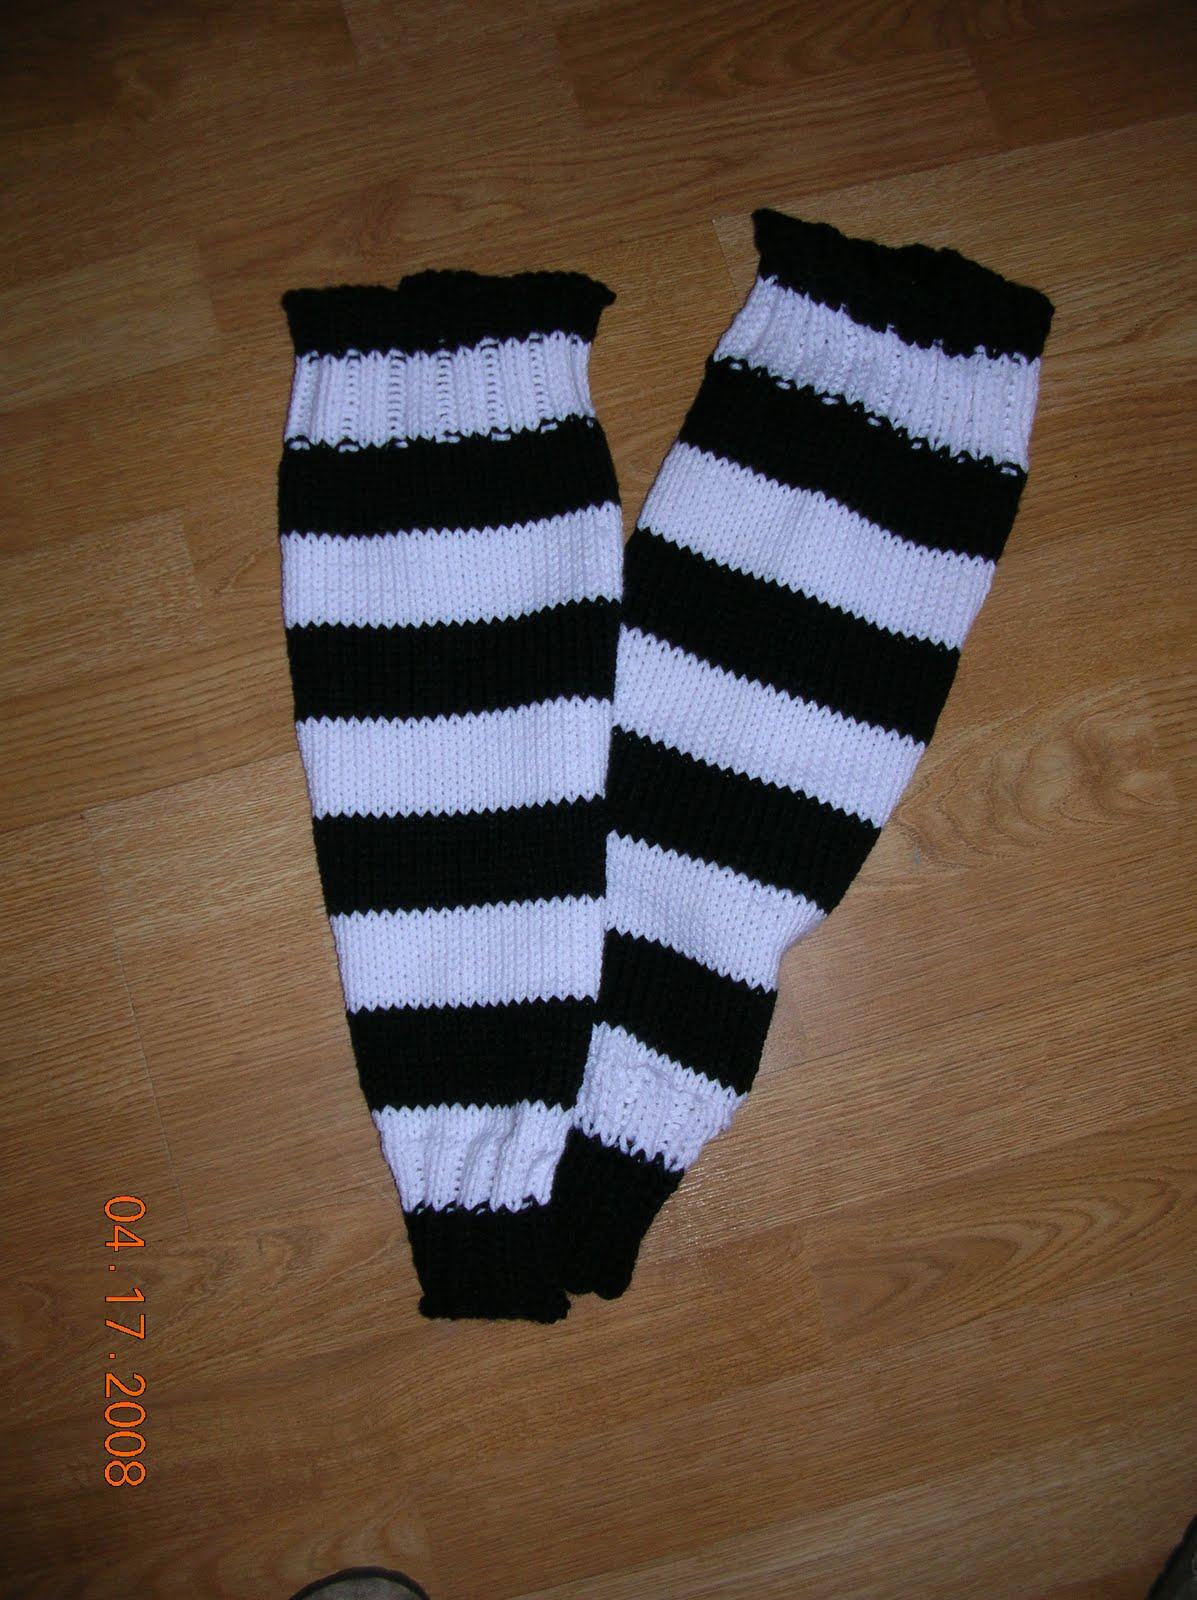 The Pixie House: Hockey Sock Knit Pattern Tutorial